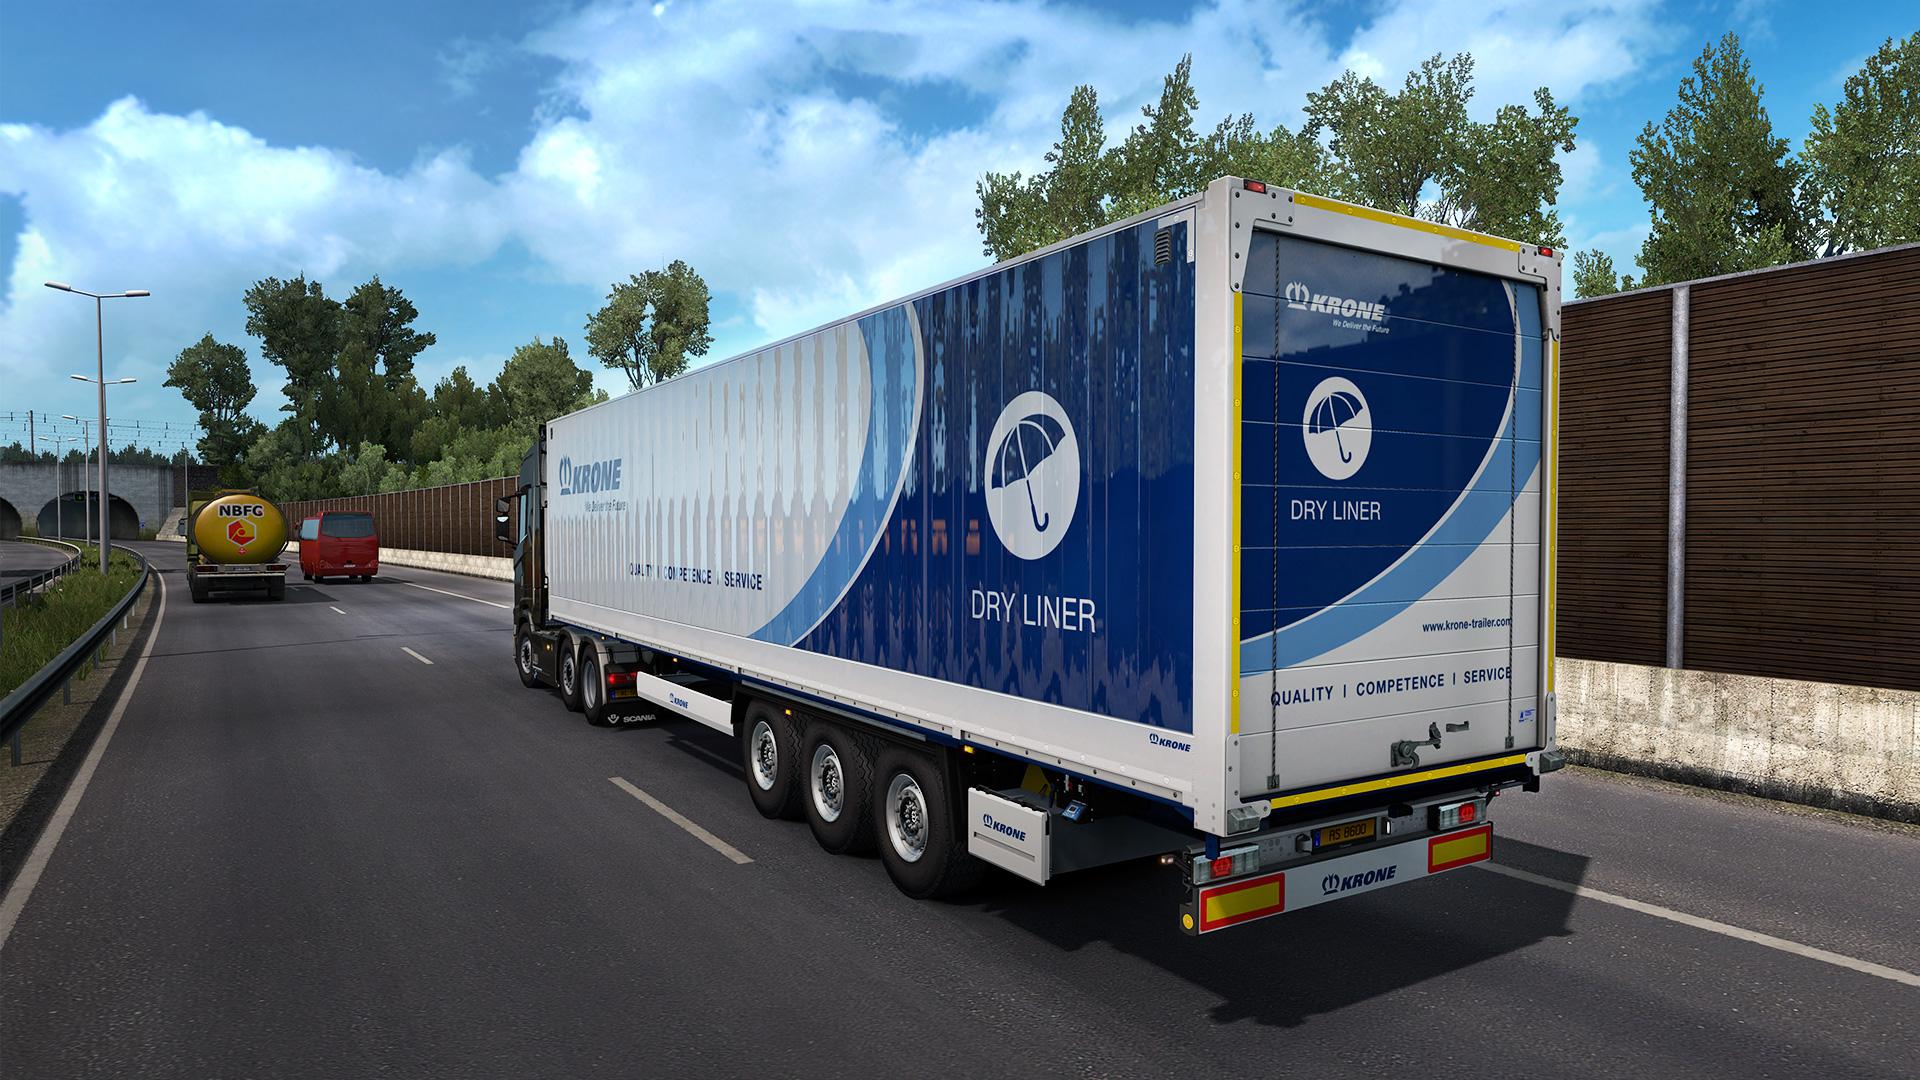 euro truck simulator 2 dlc list free download